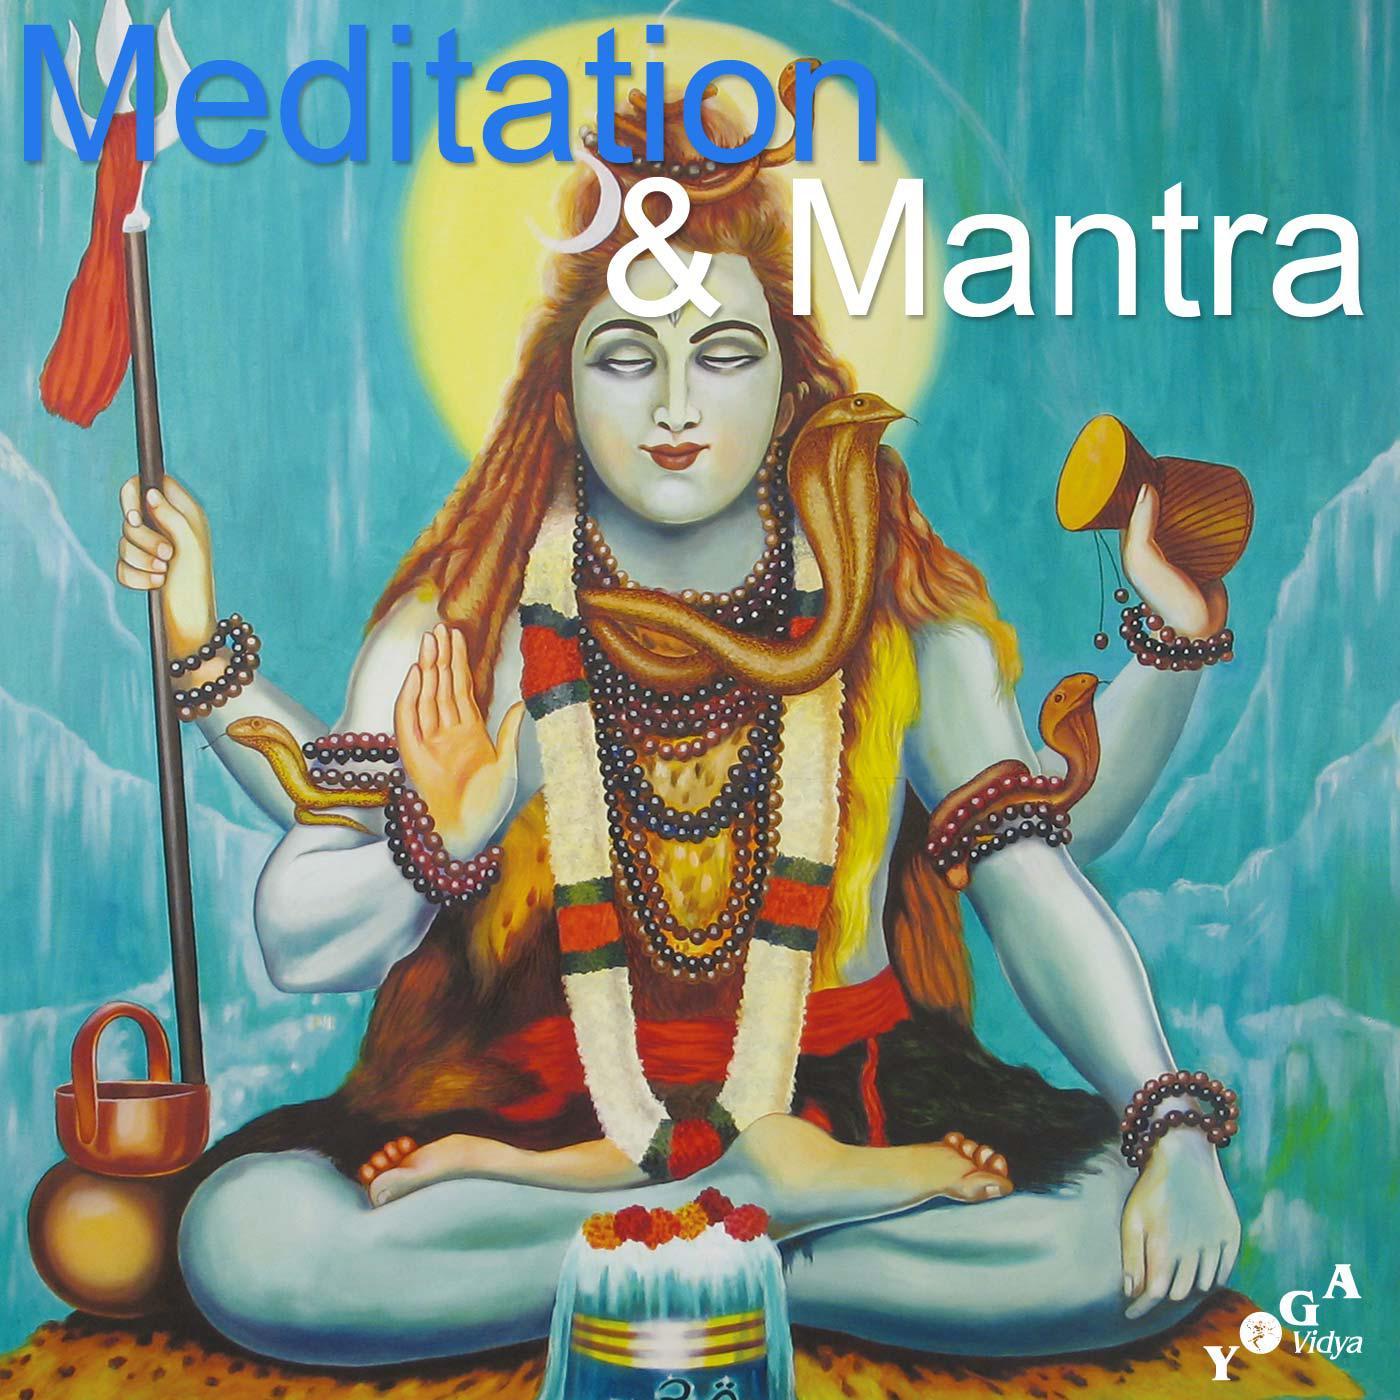 Mantra Meditation Anleitung Podcast Sukadev Bretz Yoga Vidya Listen Notes